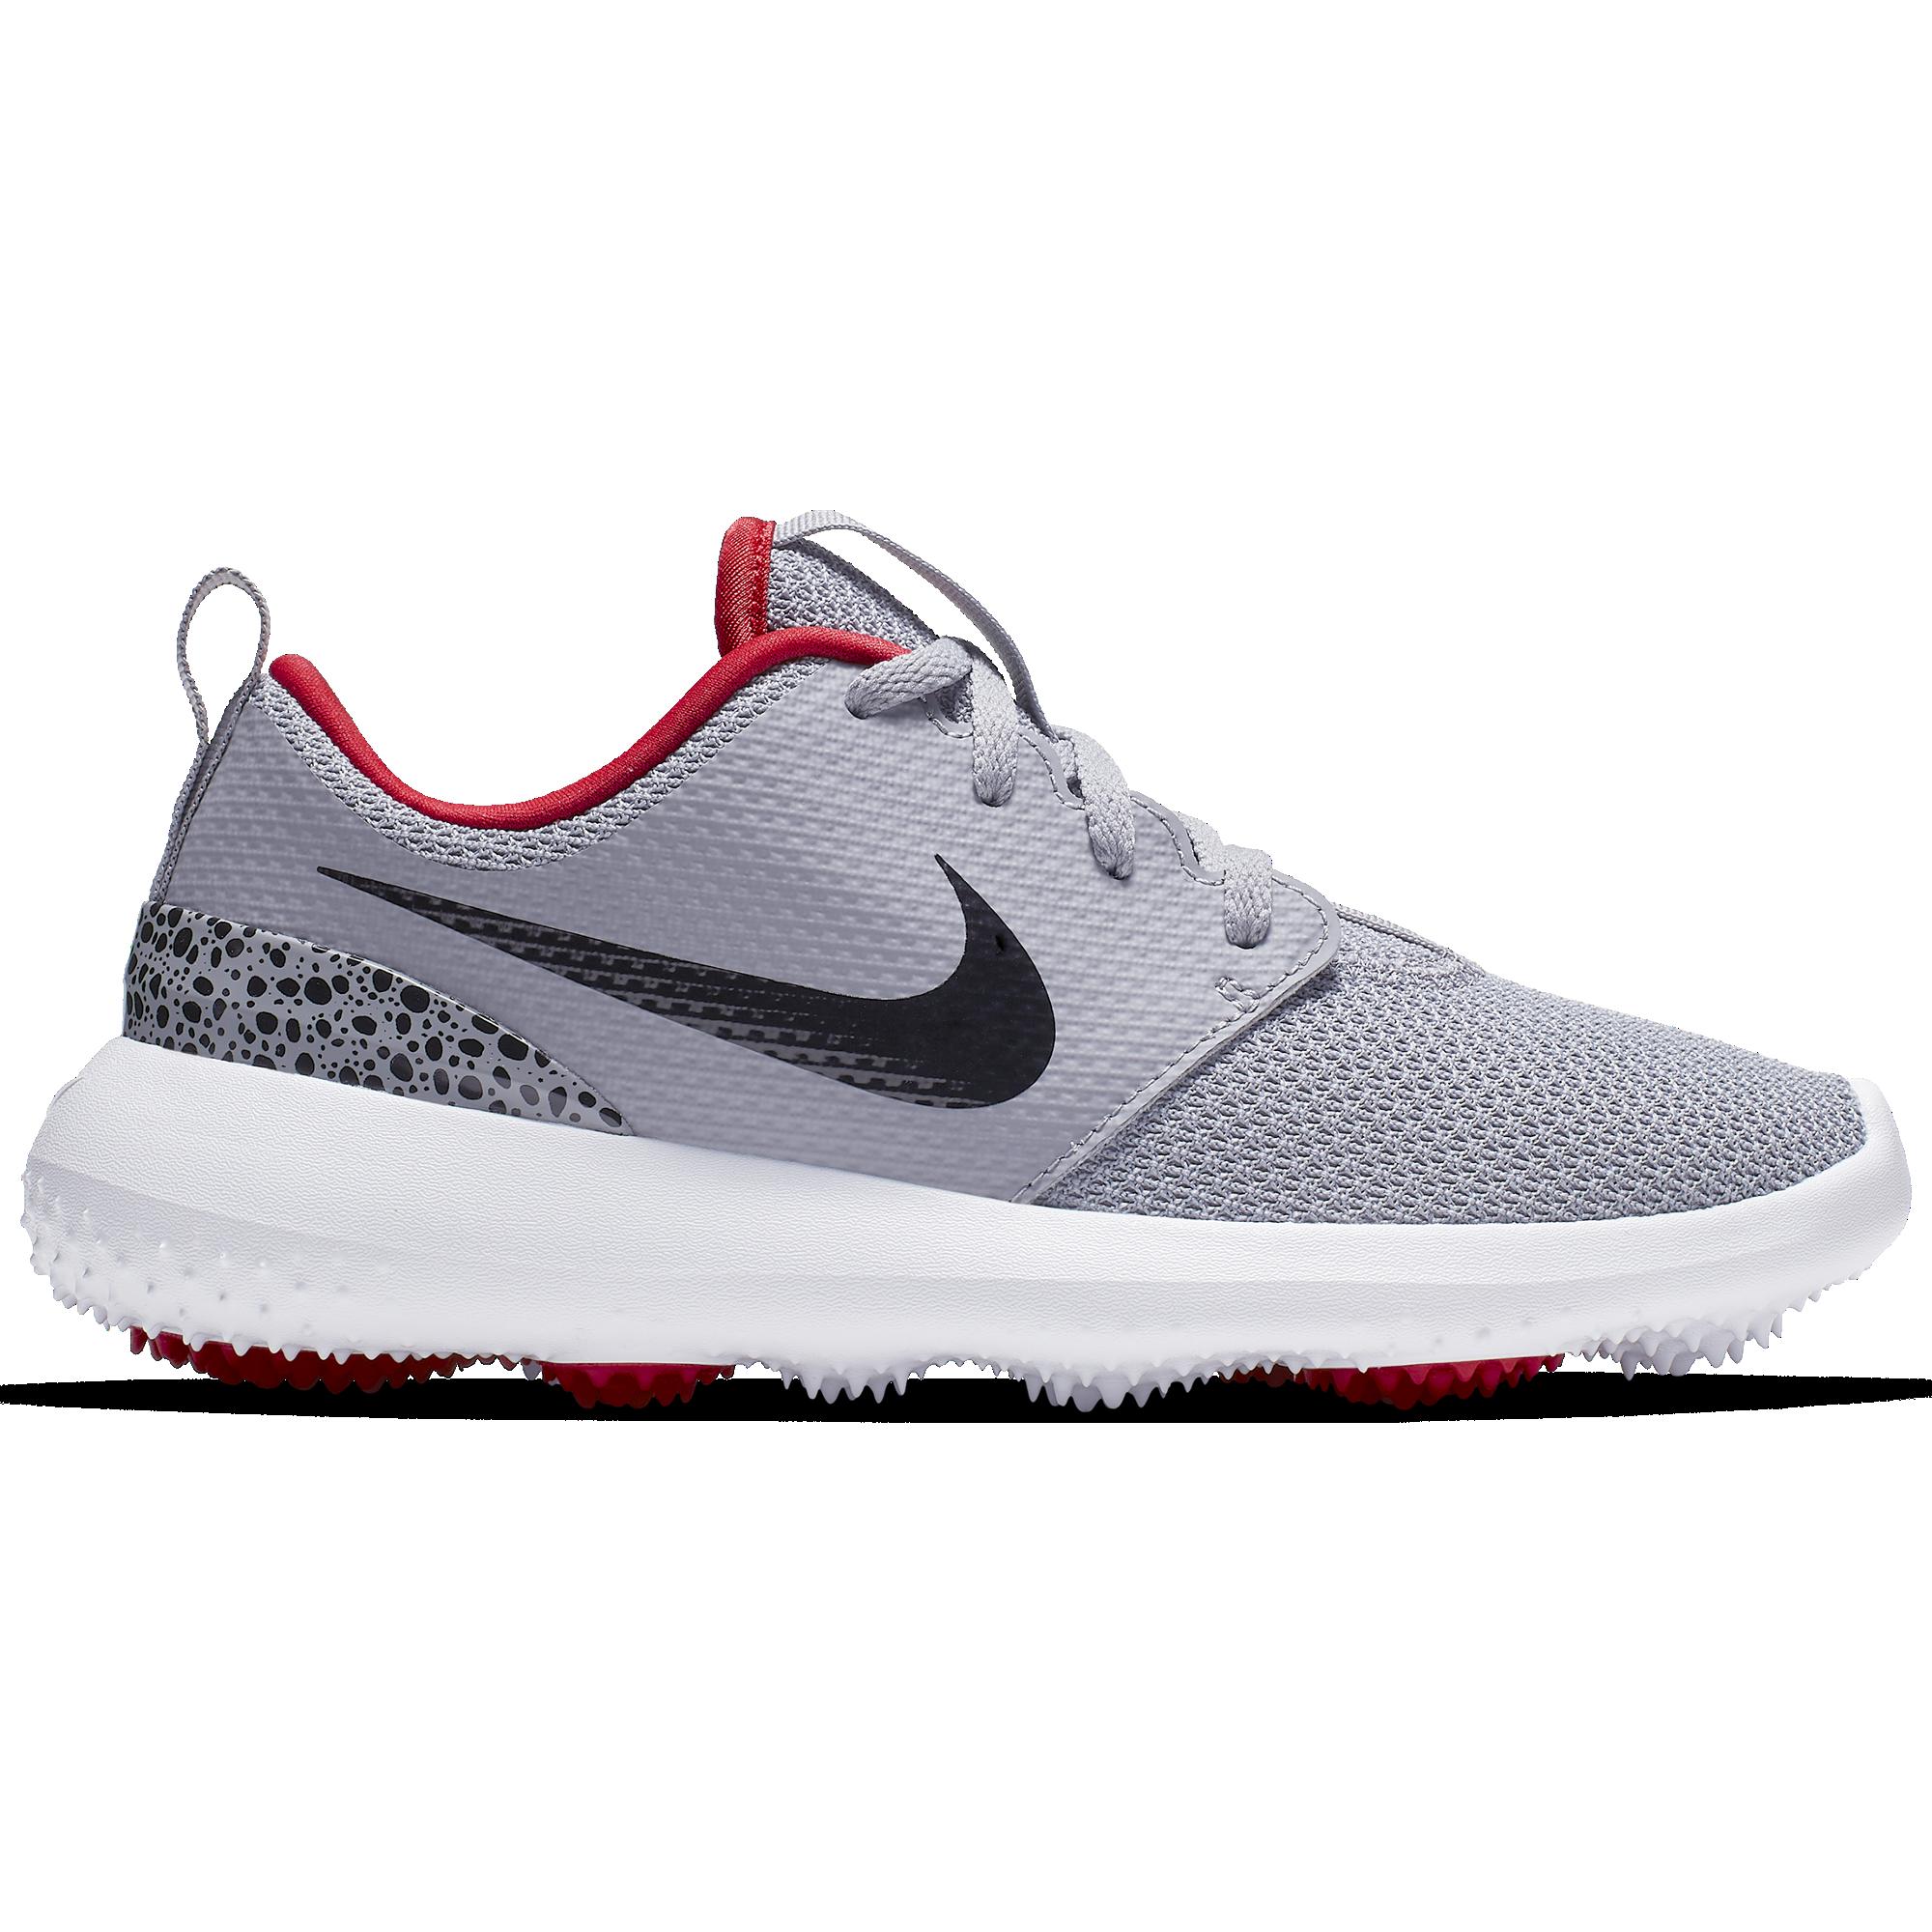 Nike Roshe G Junior Golf Shoe Grey Black Pga Tour Superstore